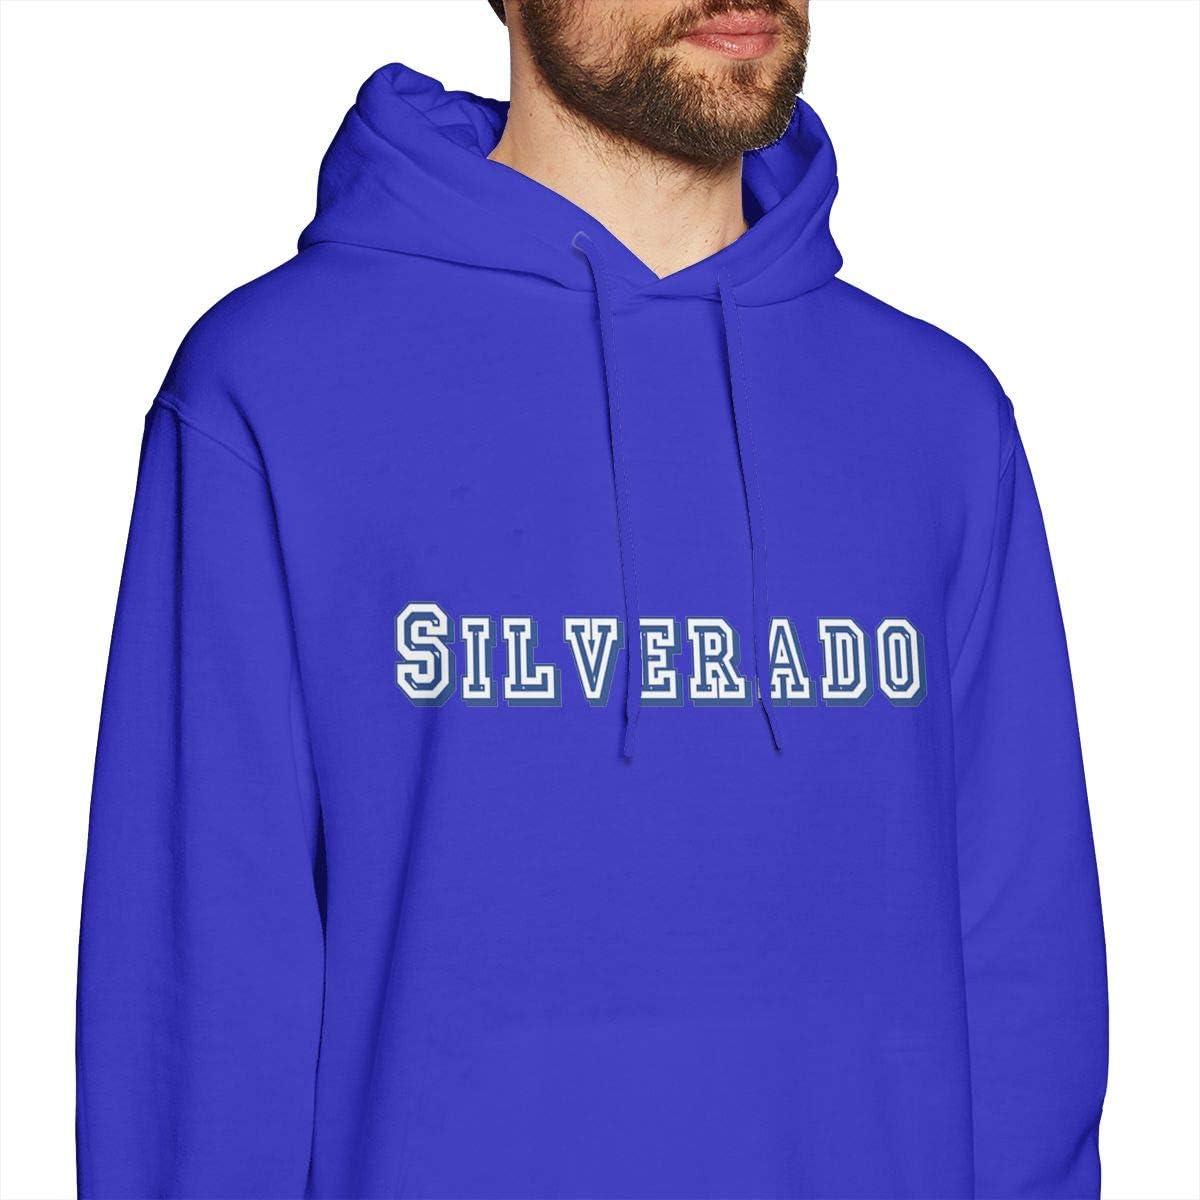 Ch-evr-olet Silverado Logo Mens Hoodies Pullover Hooded Sweatshirt Jackets Blue